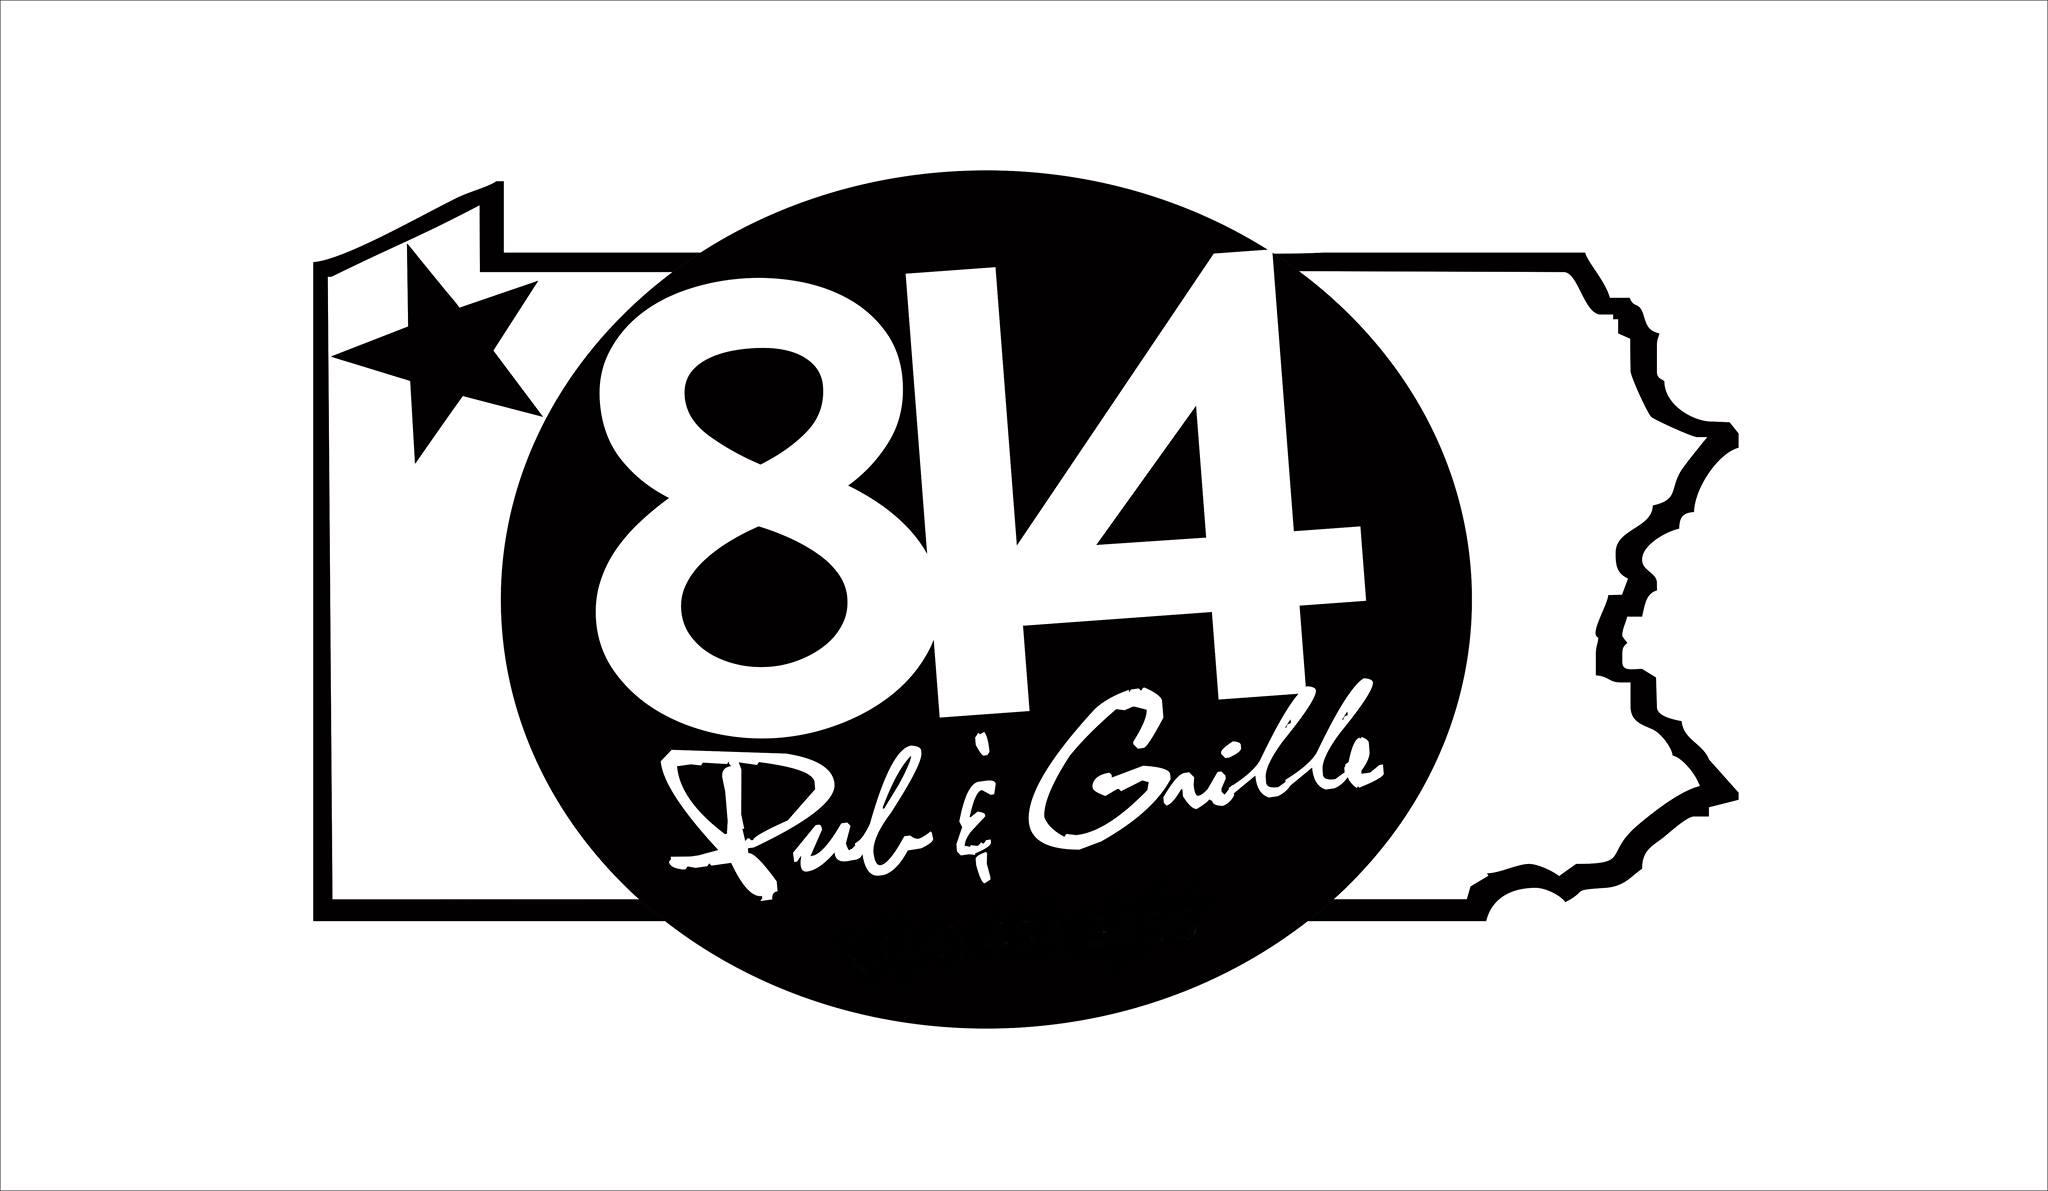 814Pub&Grille.jpeg